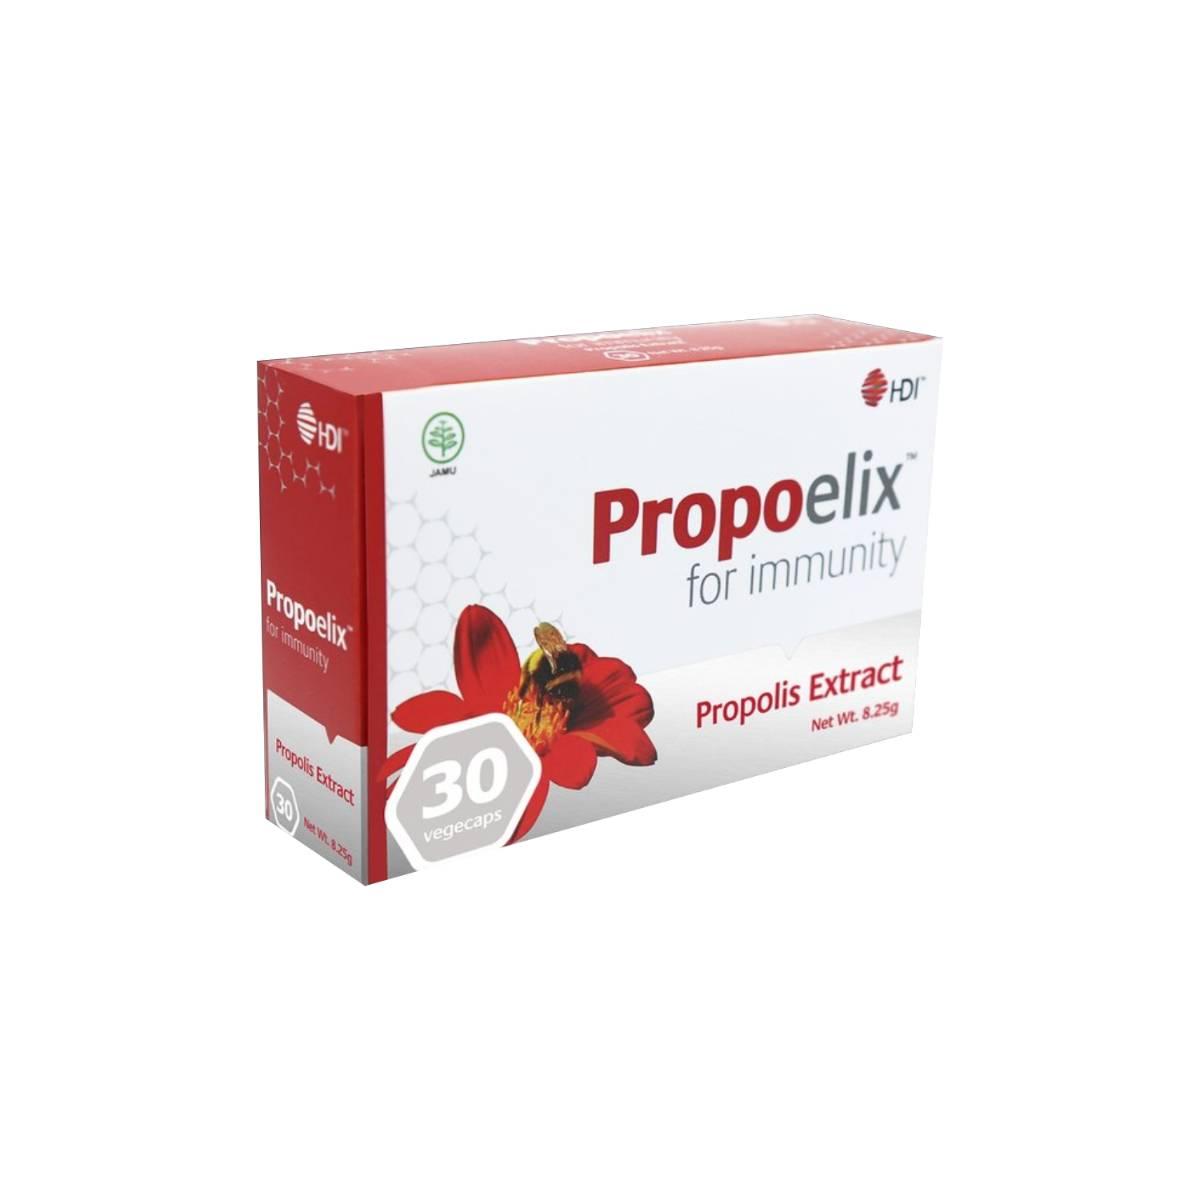 Promo Propoelix Immune Boster 60 vegecaps 200 mg